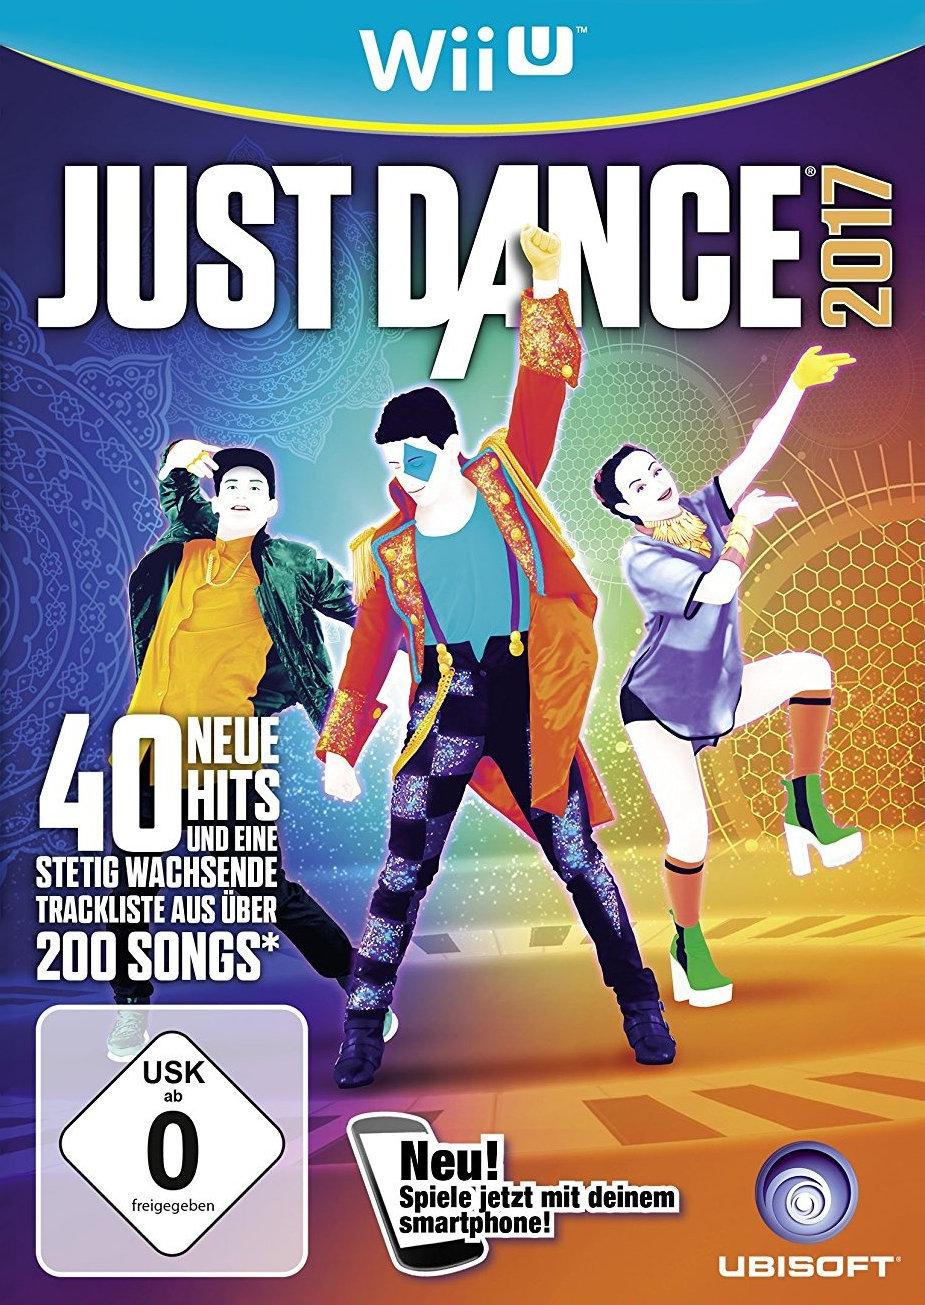 Lokal Media Markt Hamburg Nedderfeld / Just Dance Wii U 15€ , Pes 2017 Xbox One 10€ ,Track Mania Turbo PC 3€ und viele mehr ..